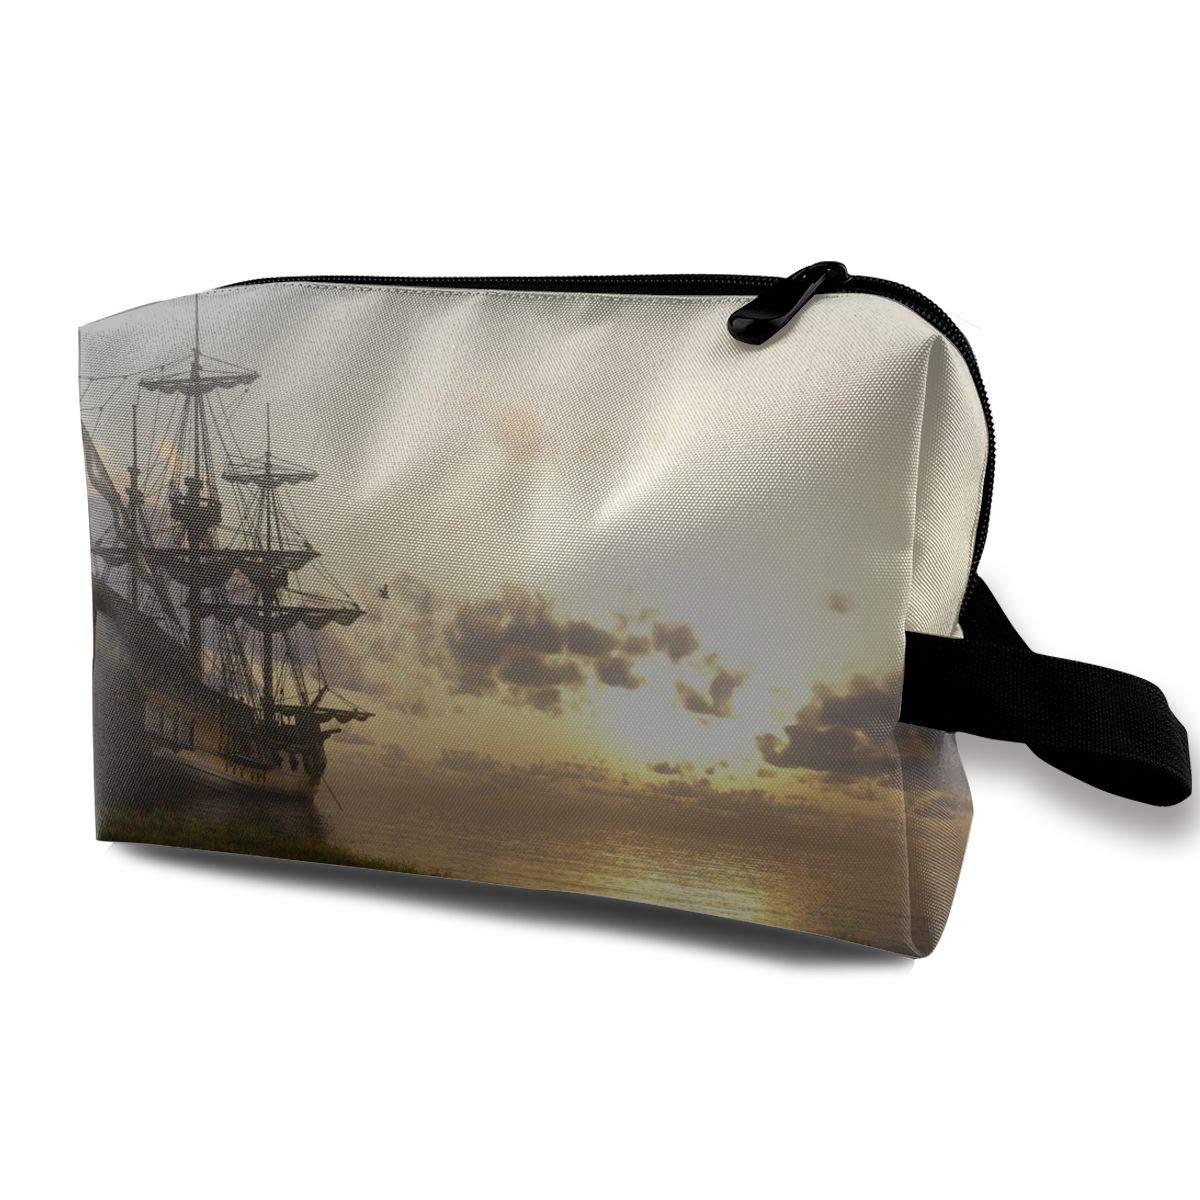 Mikonsu Fantasy Ship Sail Boat in Lake Sunset Makeup Bag Cosmetic Beauty Bag Travel Handy Organizer Pouch